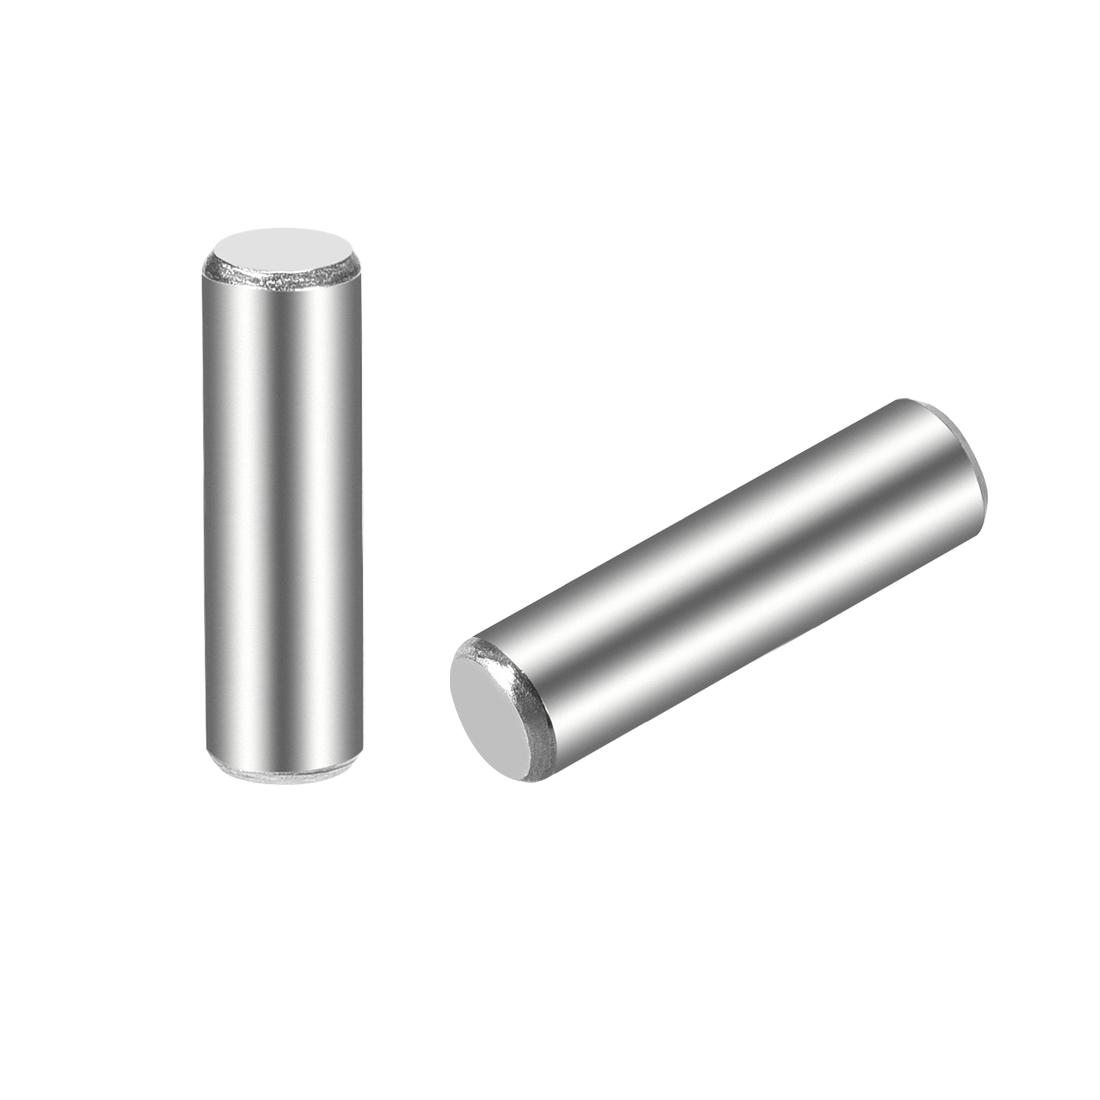 15Pcs 5mm x 18mm Dowel Pin 304 Stainless Steel Shelf Support Pin Fasten